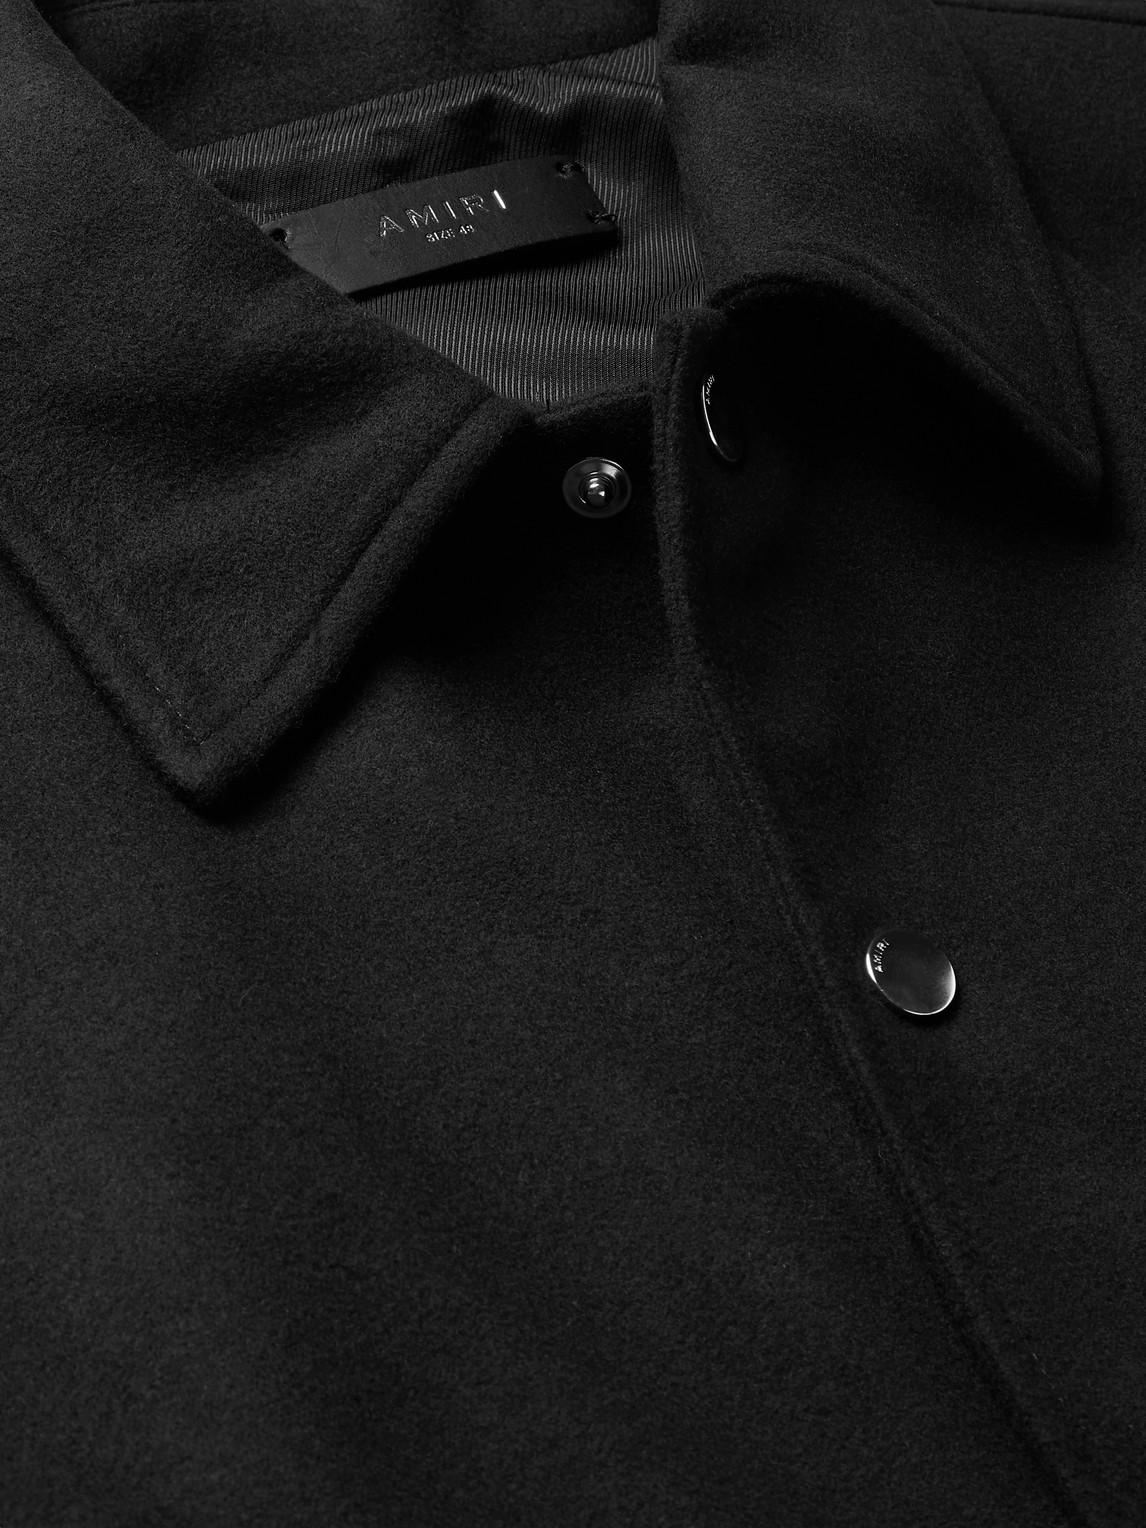 AMIRI Bomber jackets LOGO-EMBROIDERED APPLIQUÉD FLEECE BOMBER JACKET